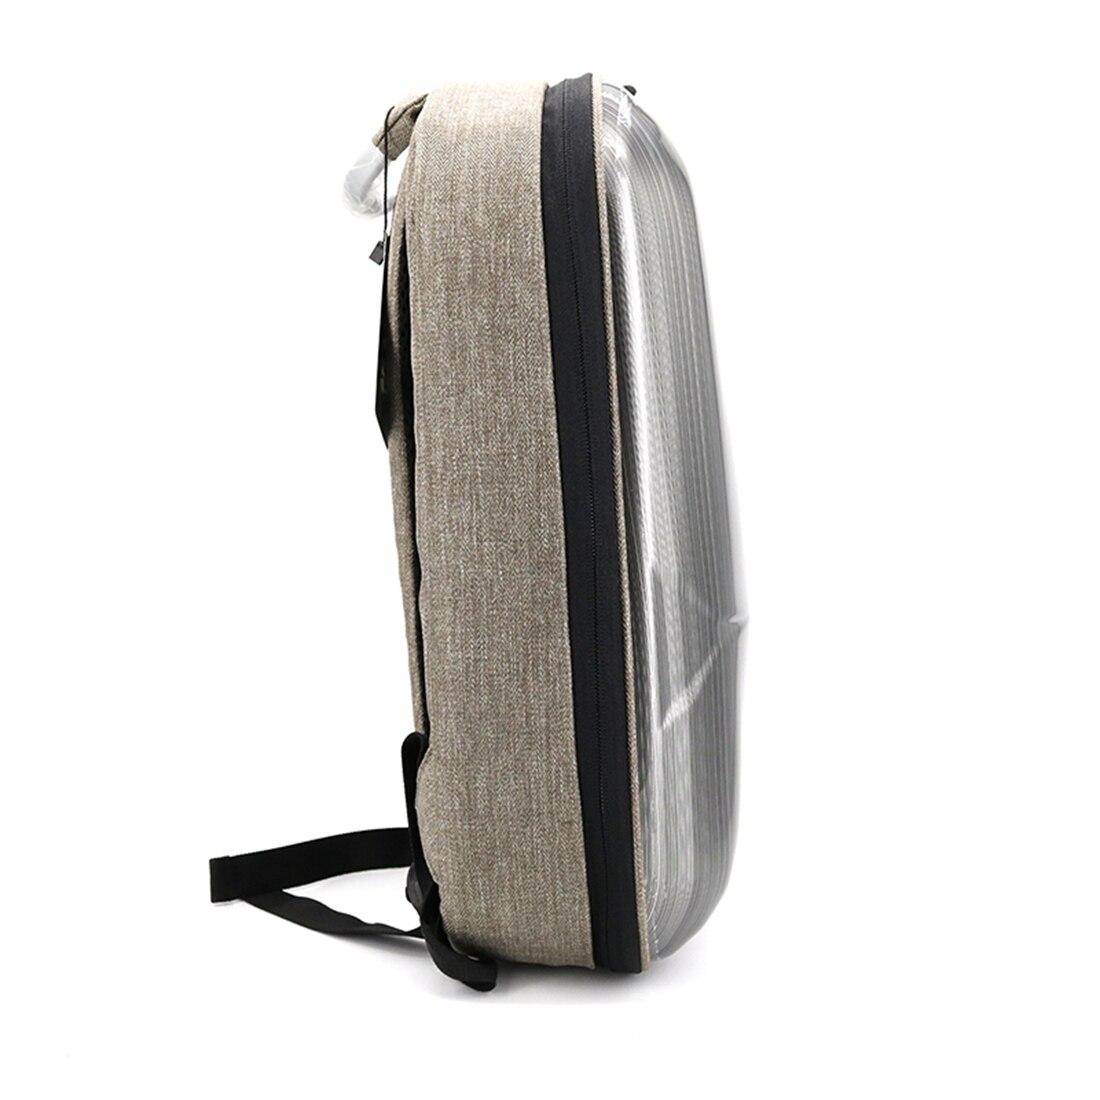 HOBBYINRC Waterproof HardShell Backpack Case Bag Sticker Battery Charger Storage Bag for DJI Mavic Pro Accessories White